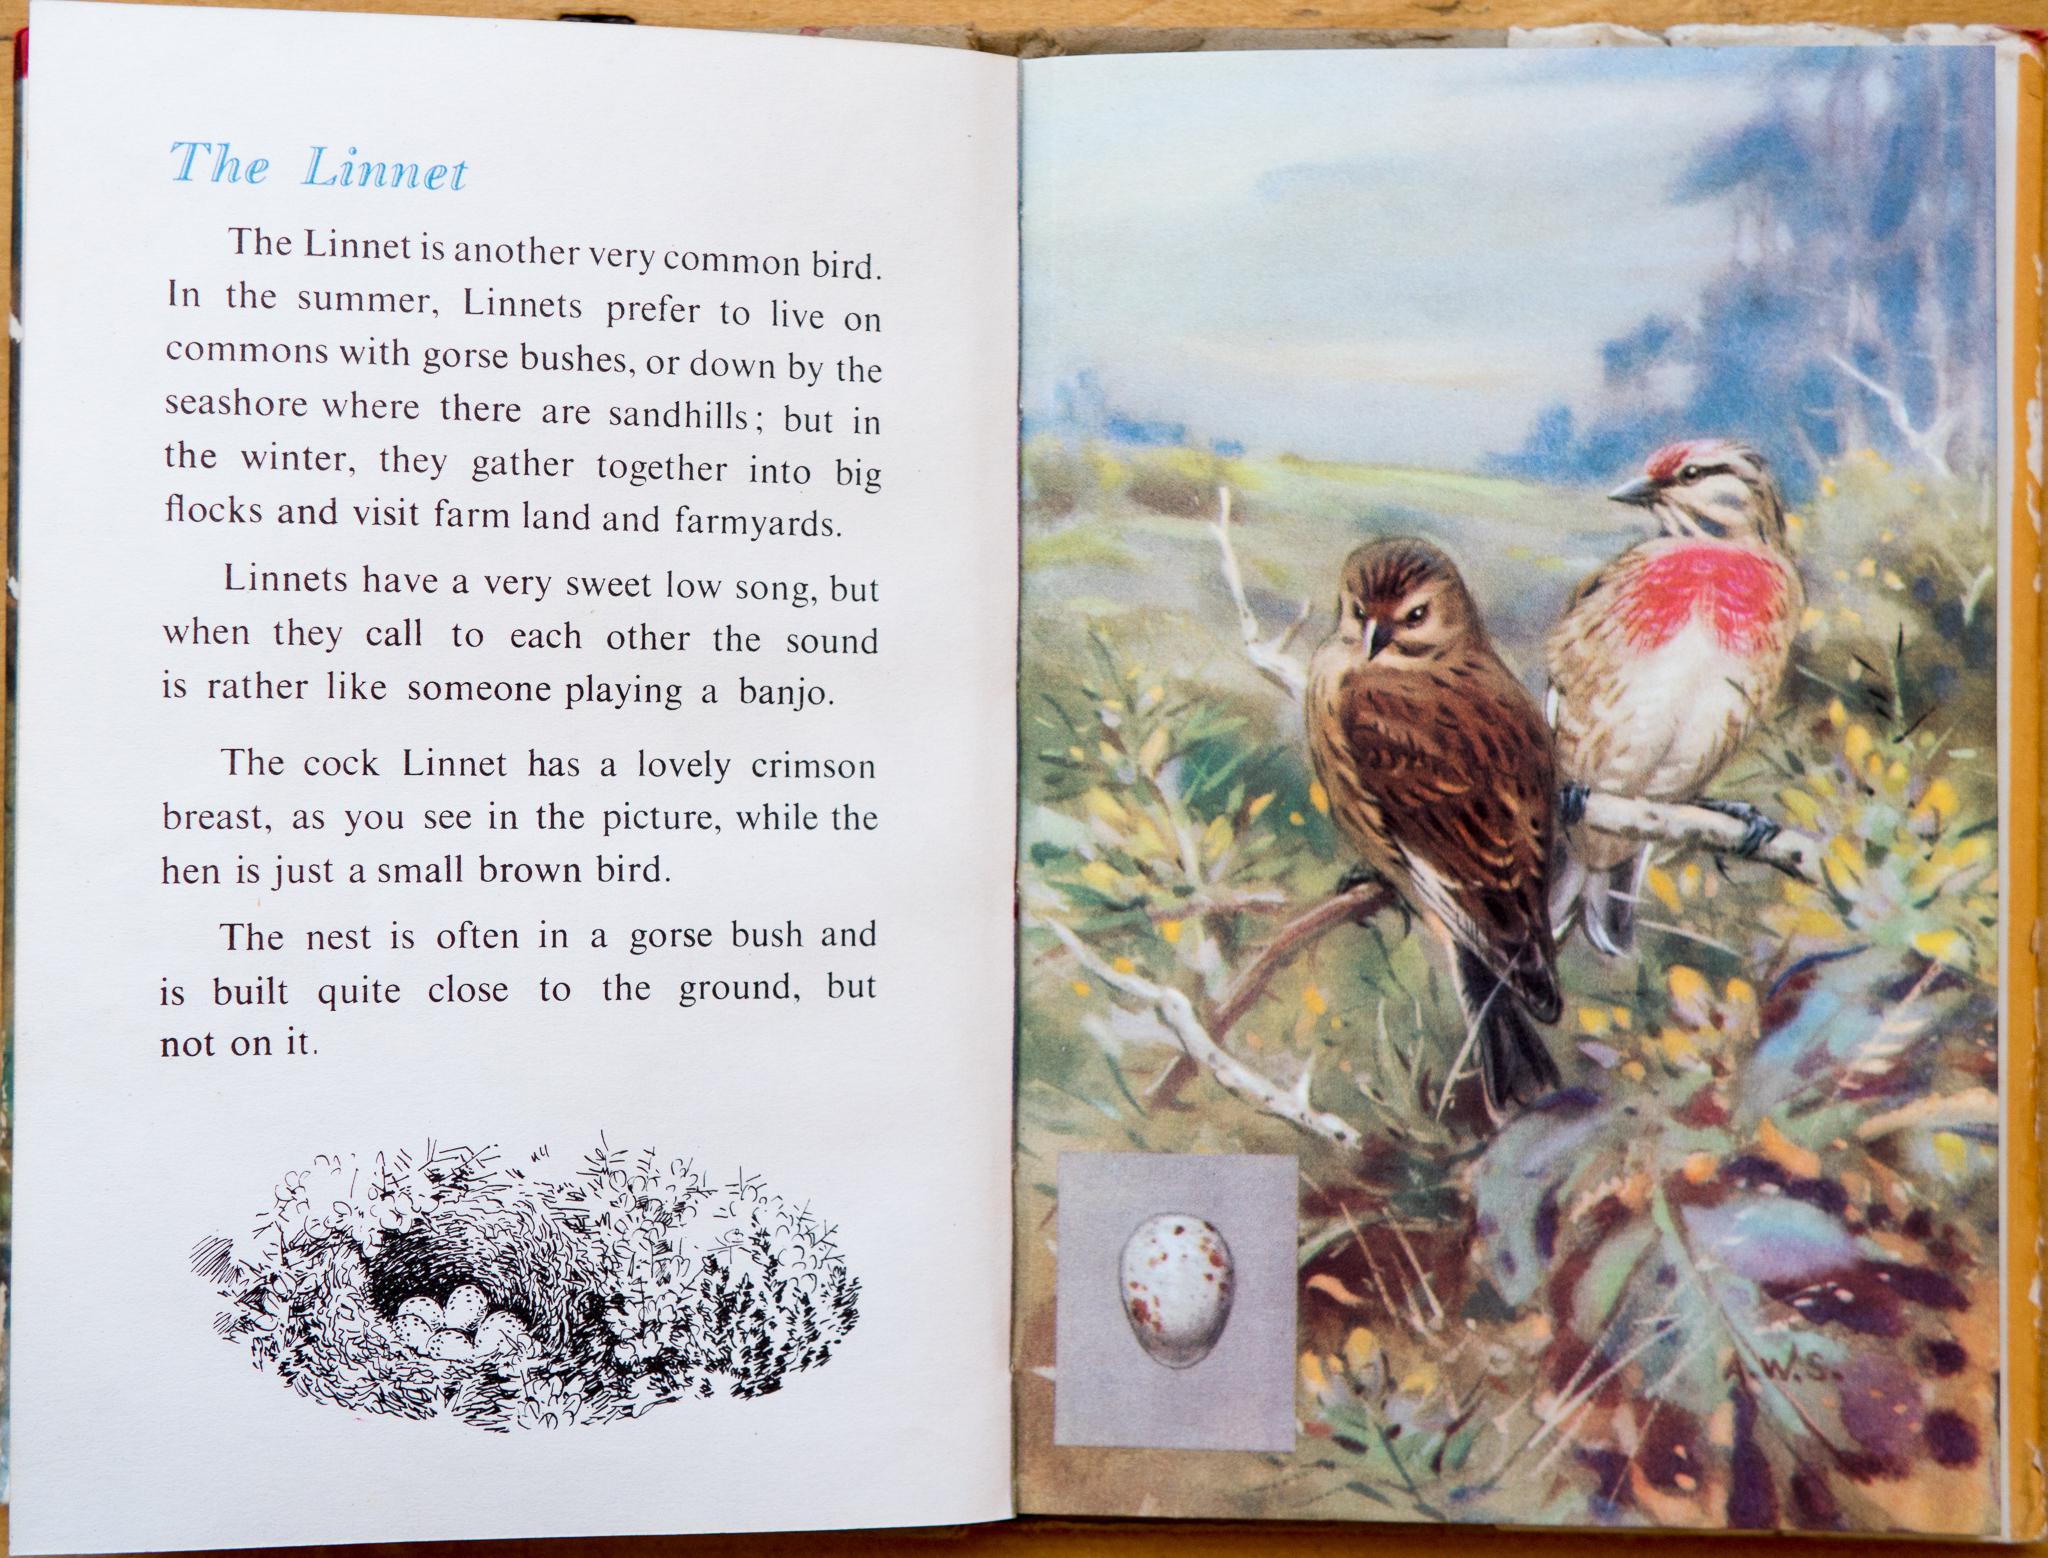 The Linnet - Ladybird Book of British Birds - The Hall of Einar